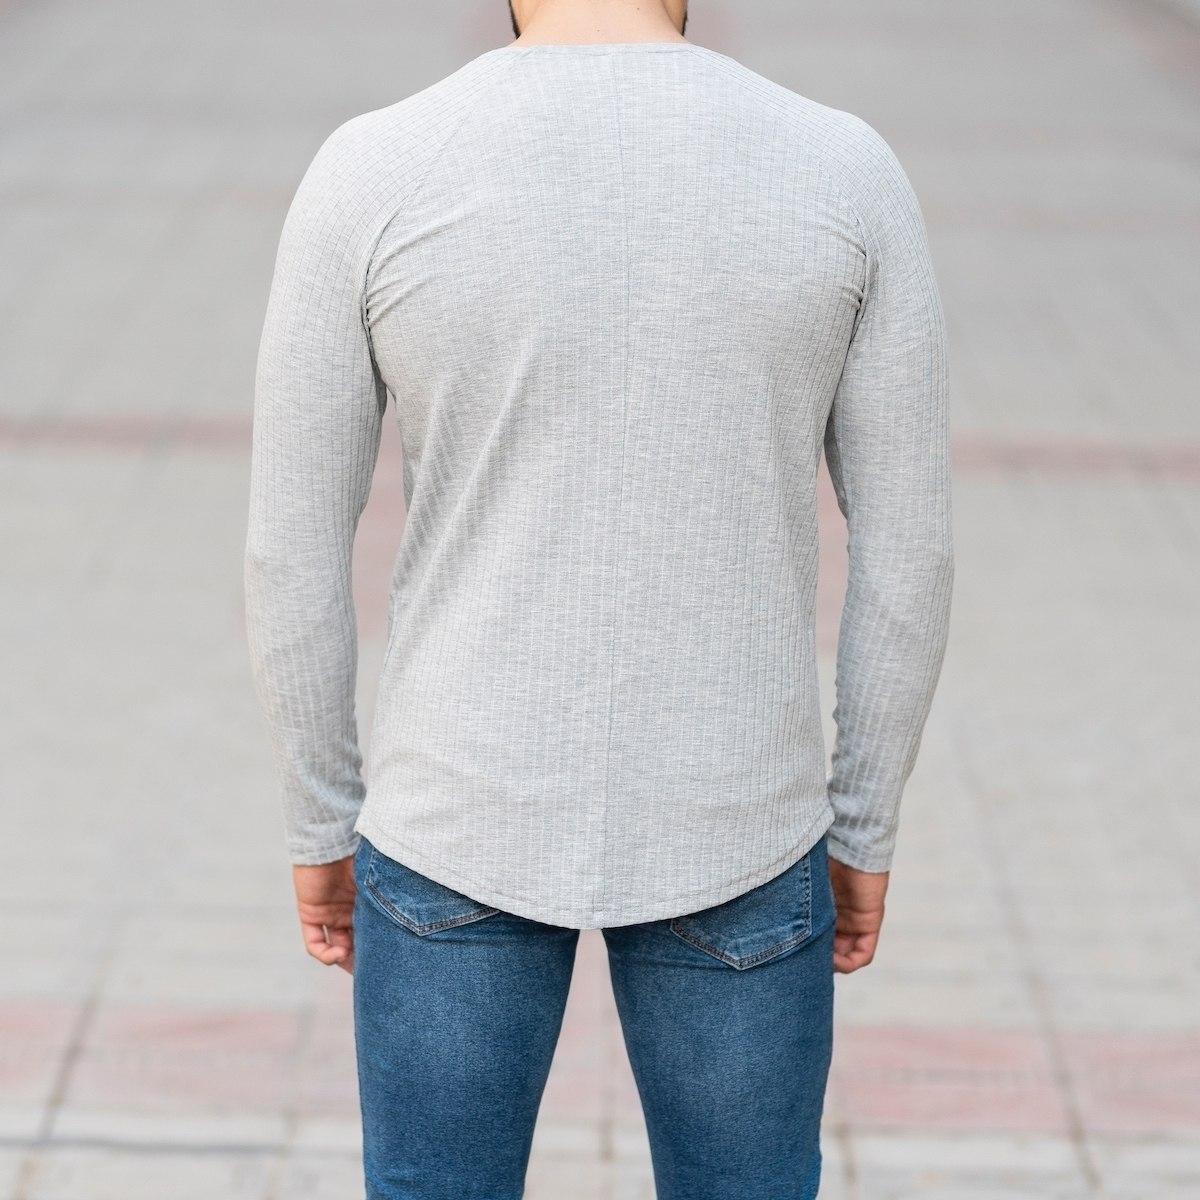 Stone Gray Sweatshirt With Stripe Details Mv Premium Brand - 5